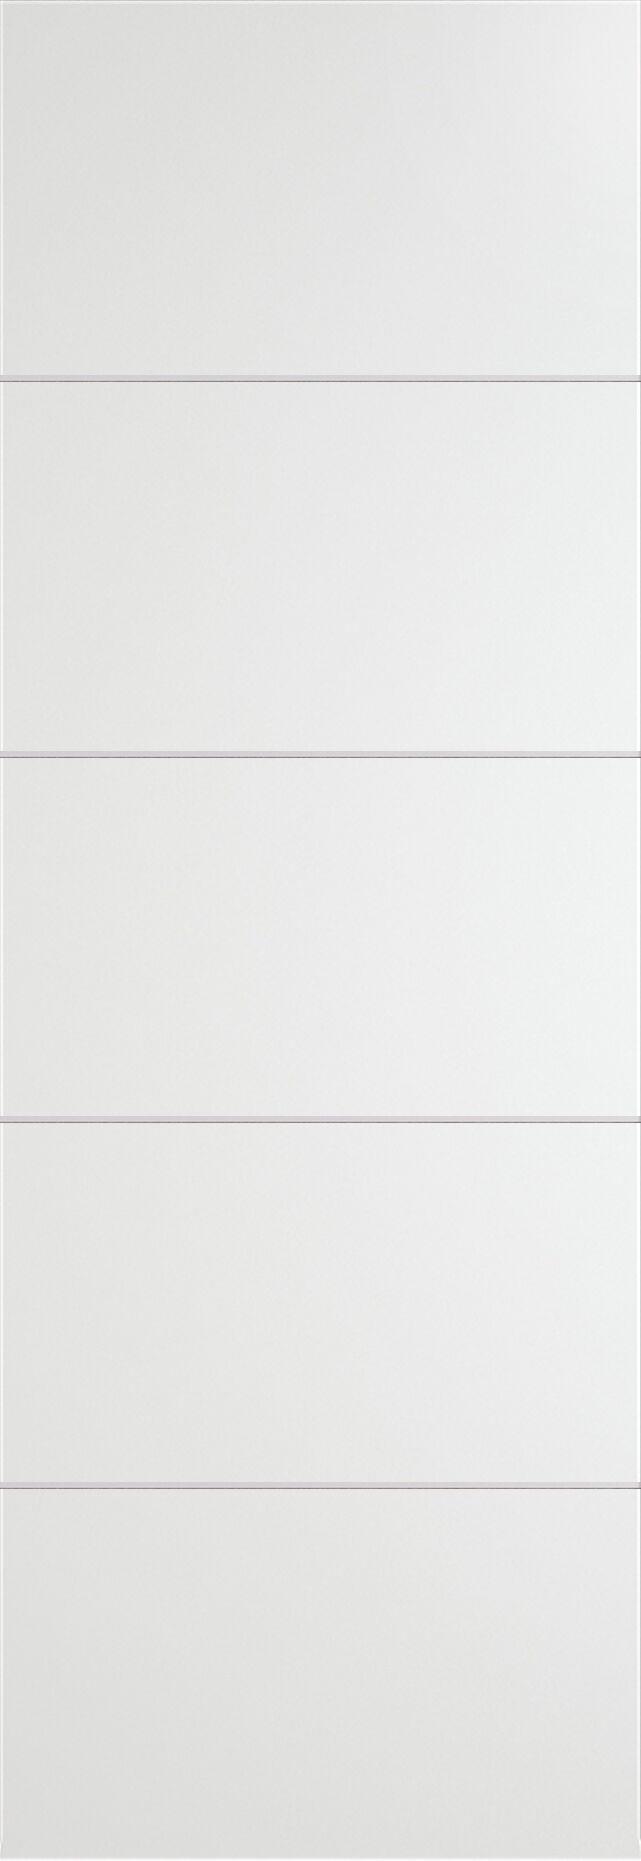 Tivoli Д-3 Invisible цвет - Белая эмаль Без стекла (ДГ)